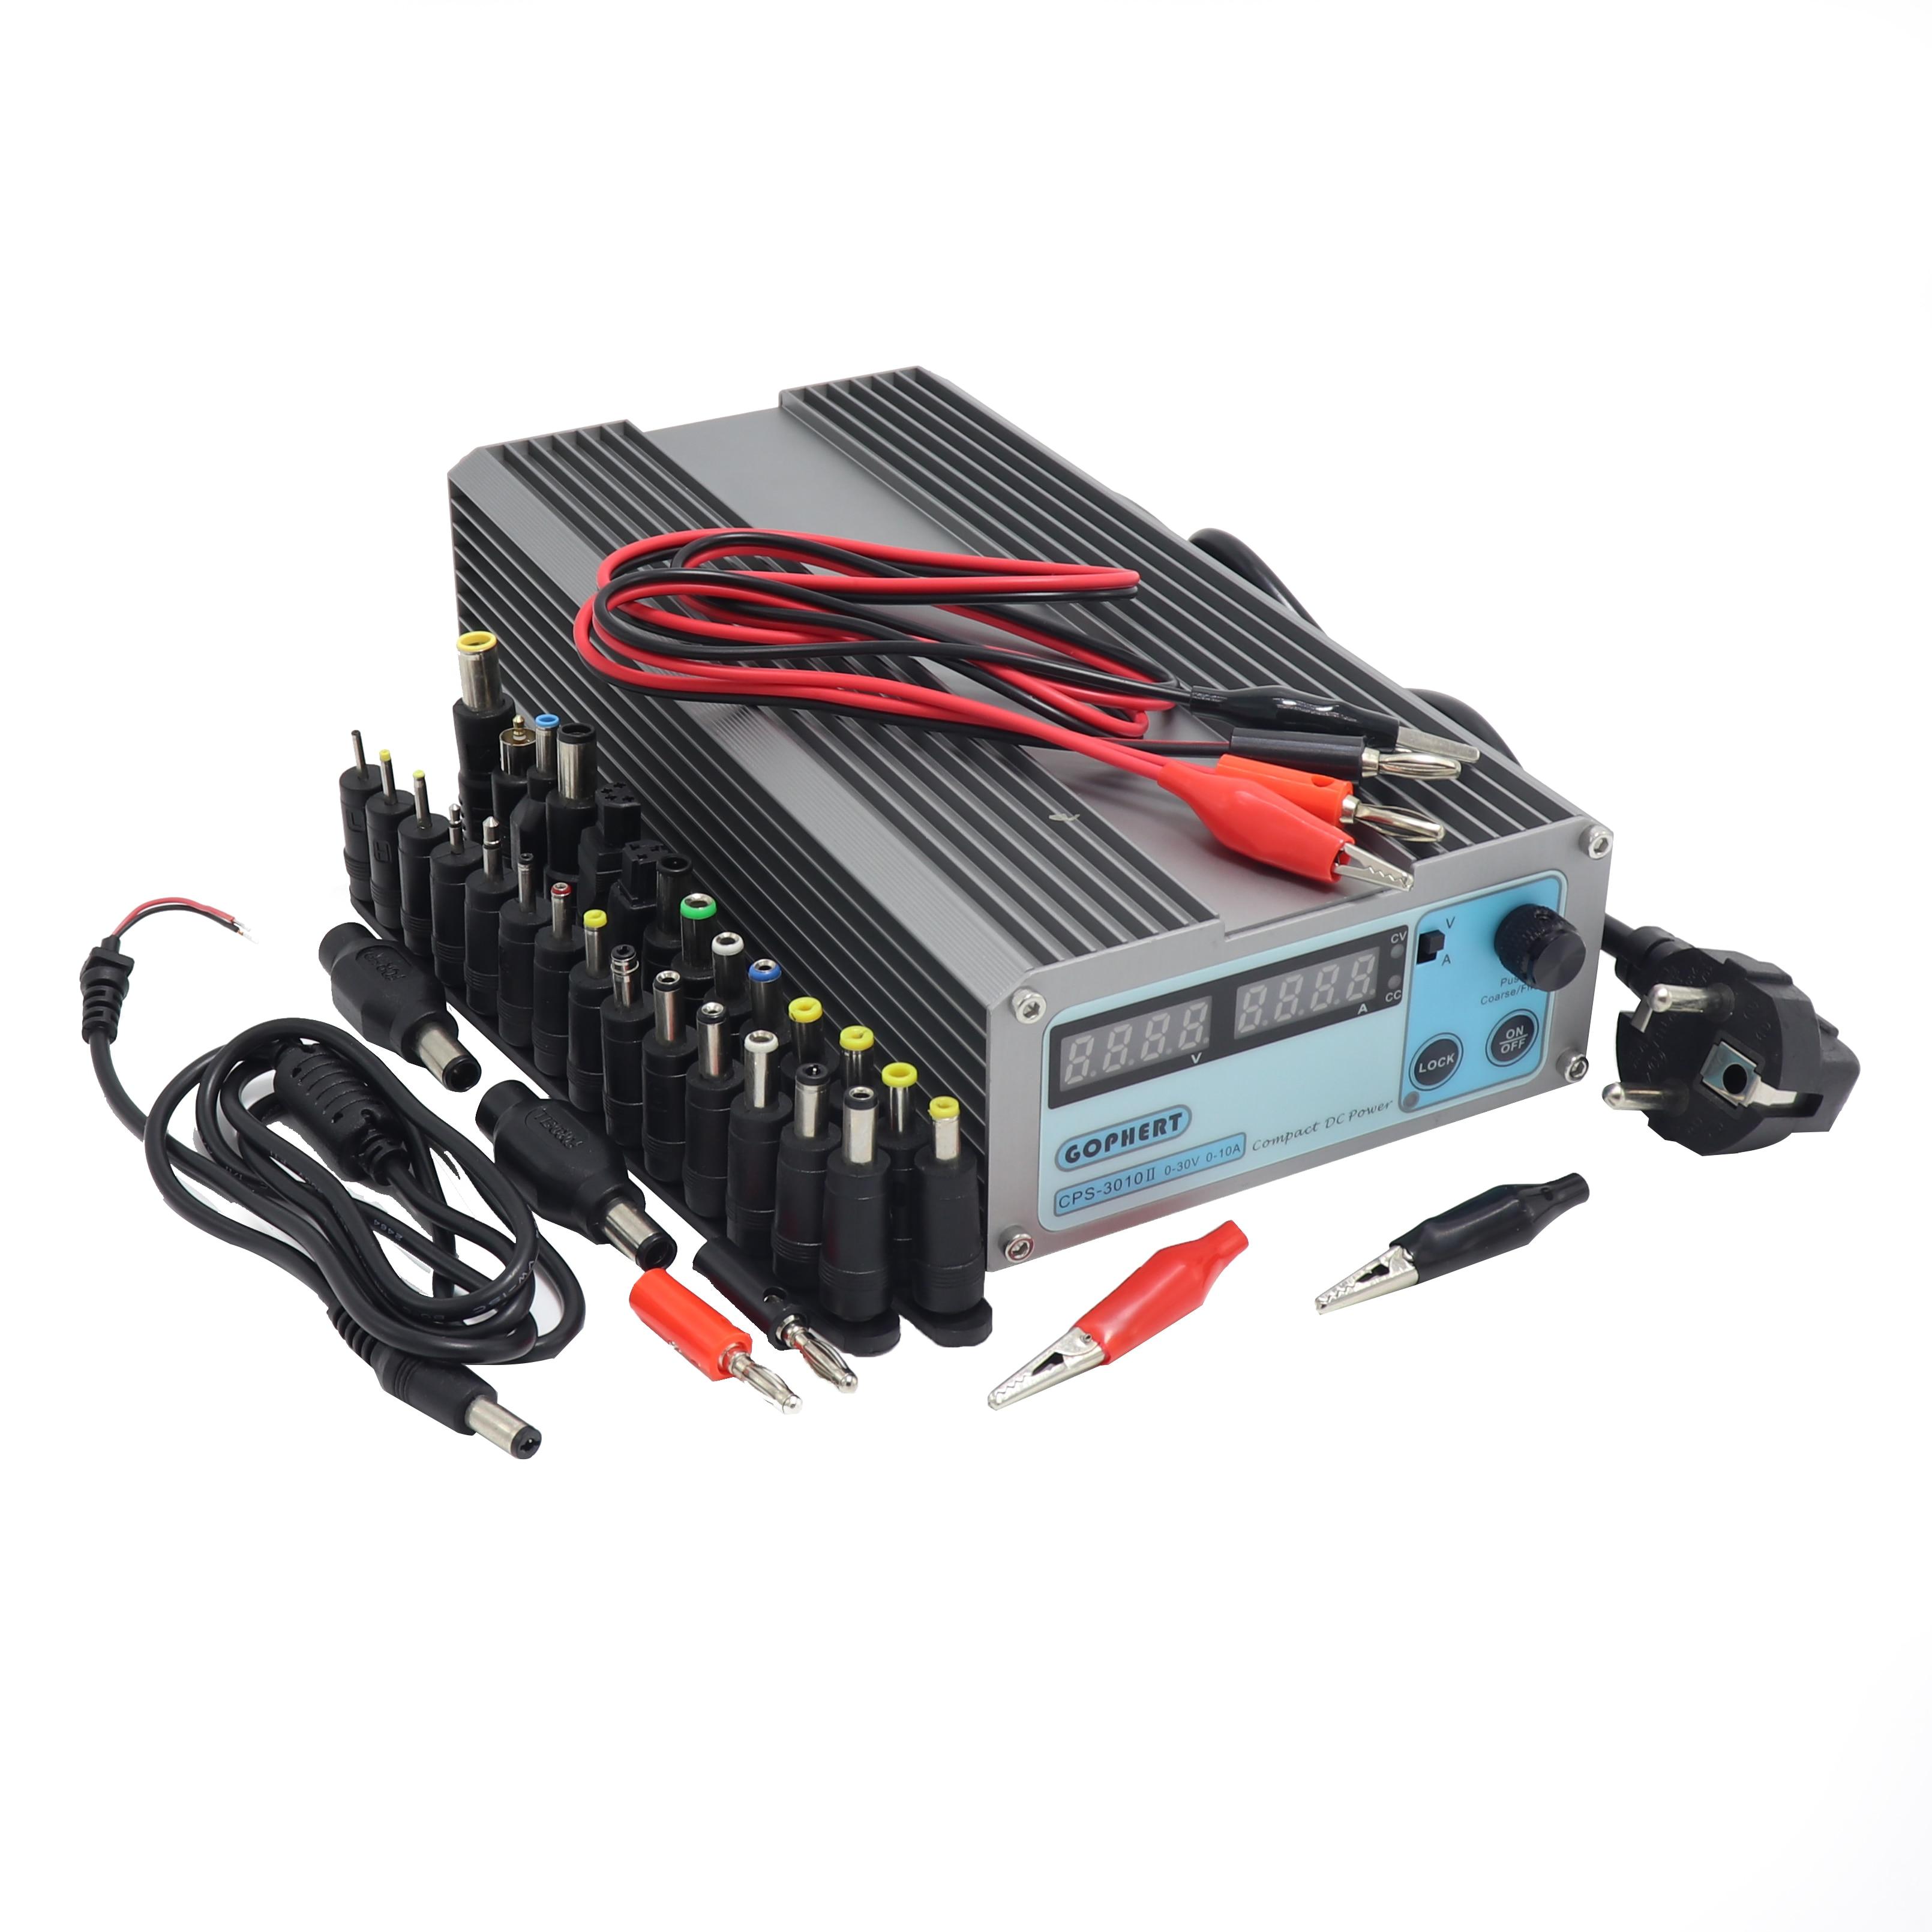 MiniCPS-3010II DC alimentation + banane clip fil EU UK US adaptateur OVP/OCP/OTP faible puissance 110 V-230 V 0-30 v 0-10A CPS-3010